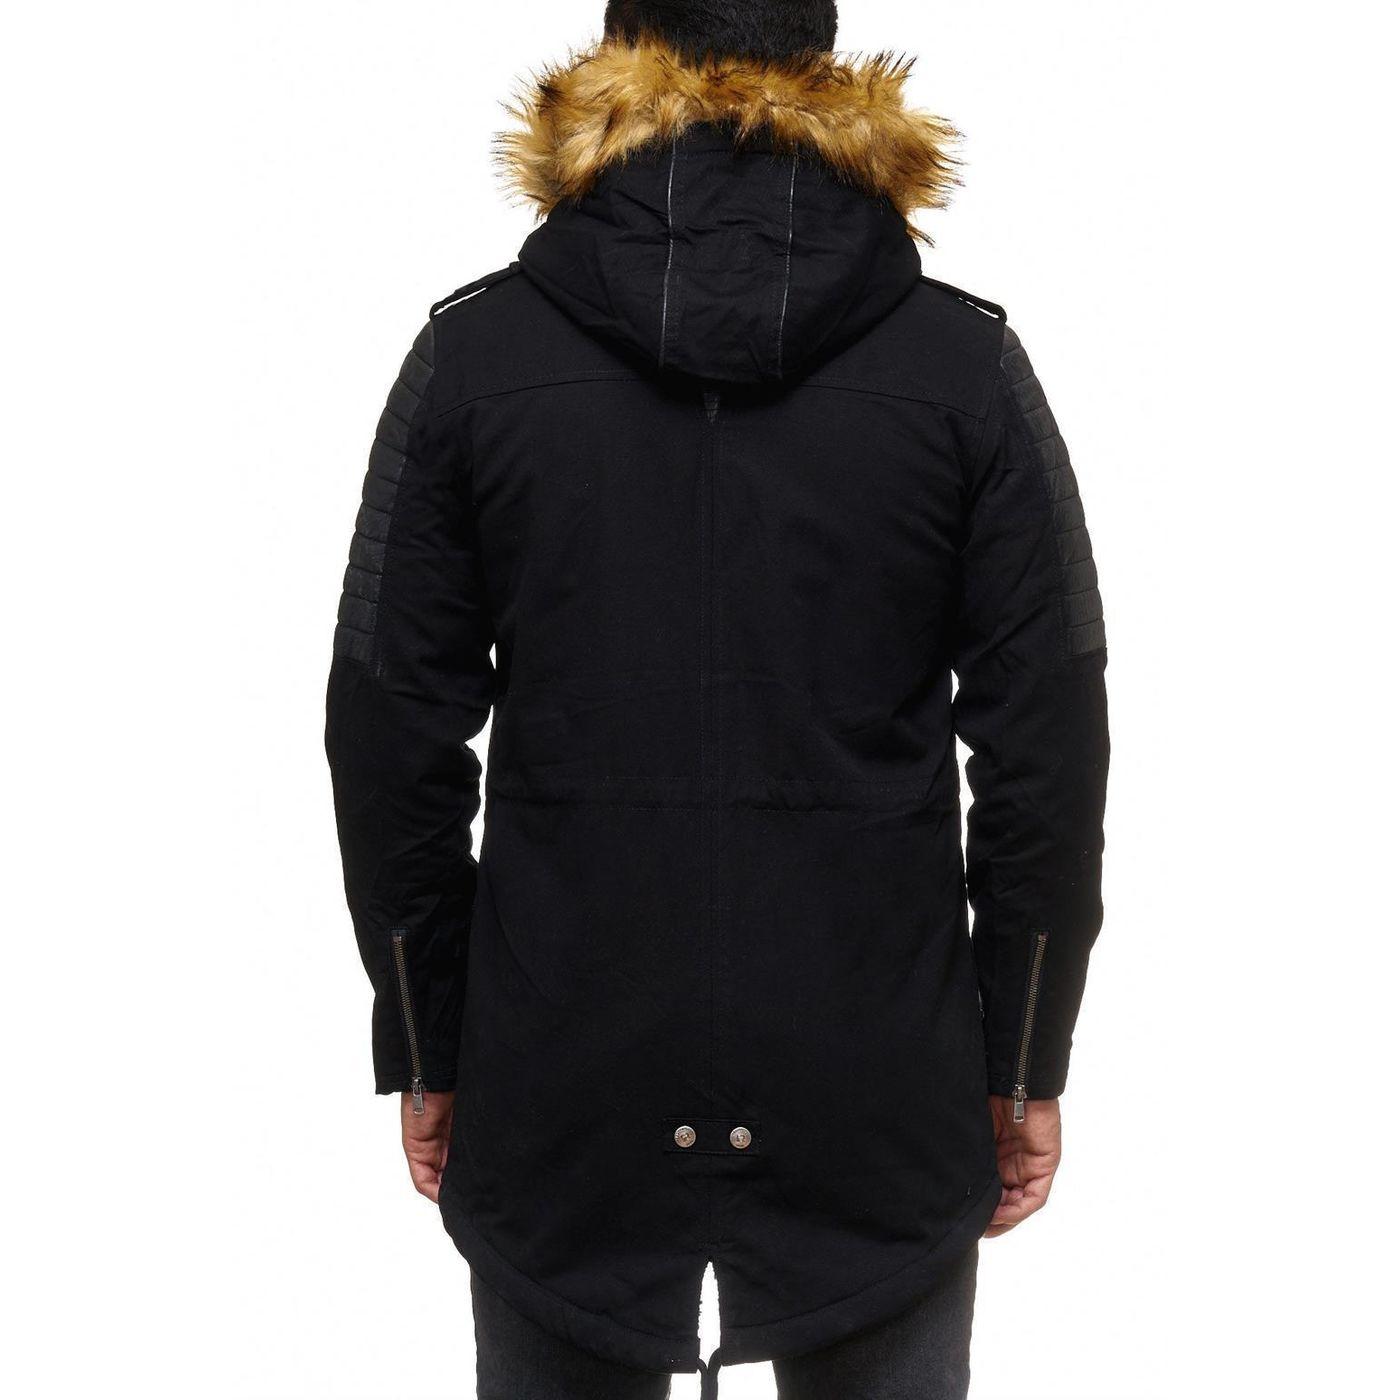 Produkt Produkt Herren Herren Produkt Produkt Herren Winterjacke Winterjacke Produkt Herren Winterjacke Produkt Herren Winterjacke Winterjacke OXTZulwPki